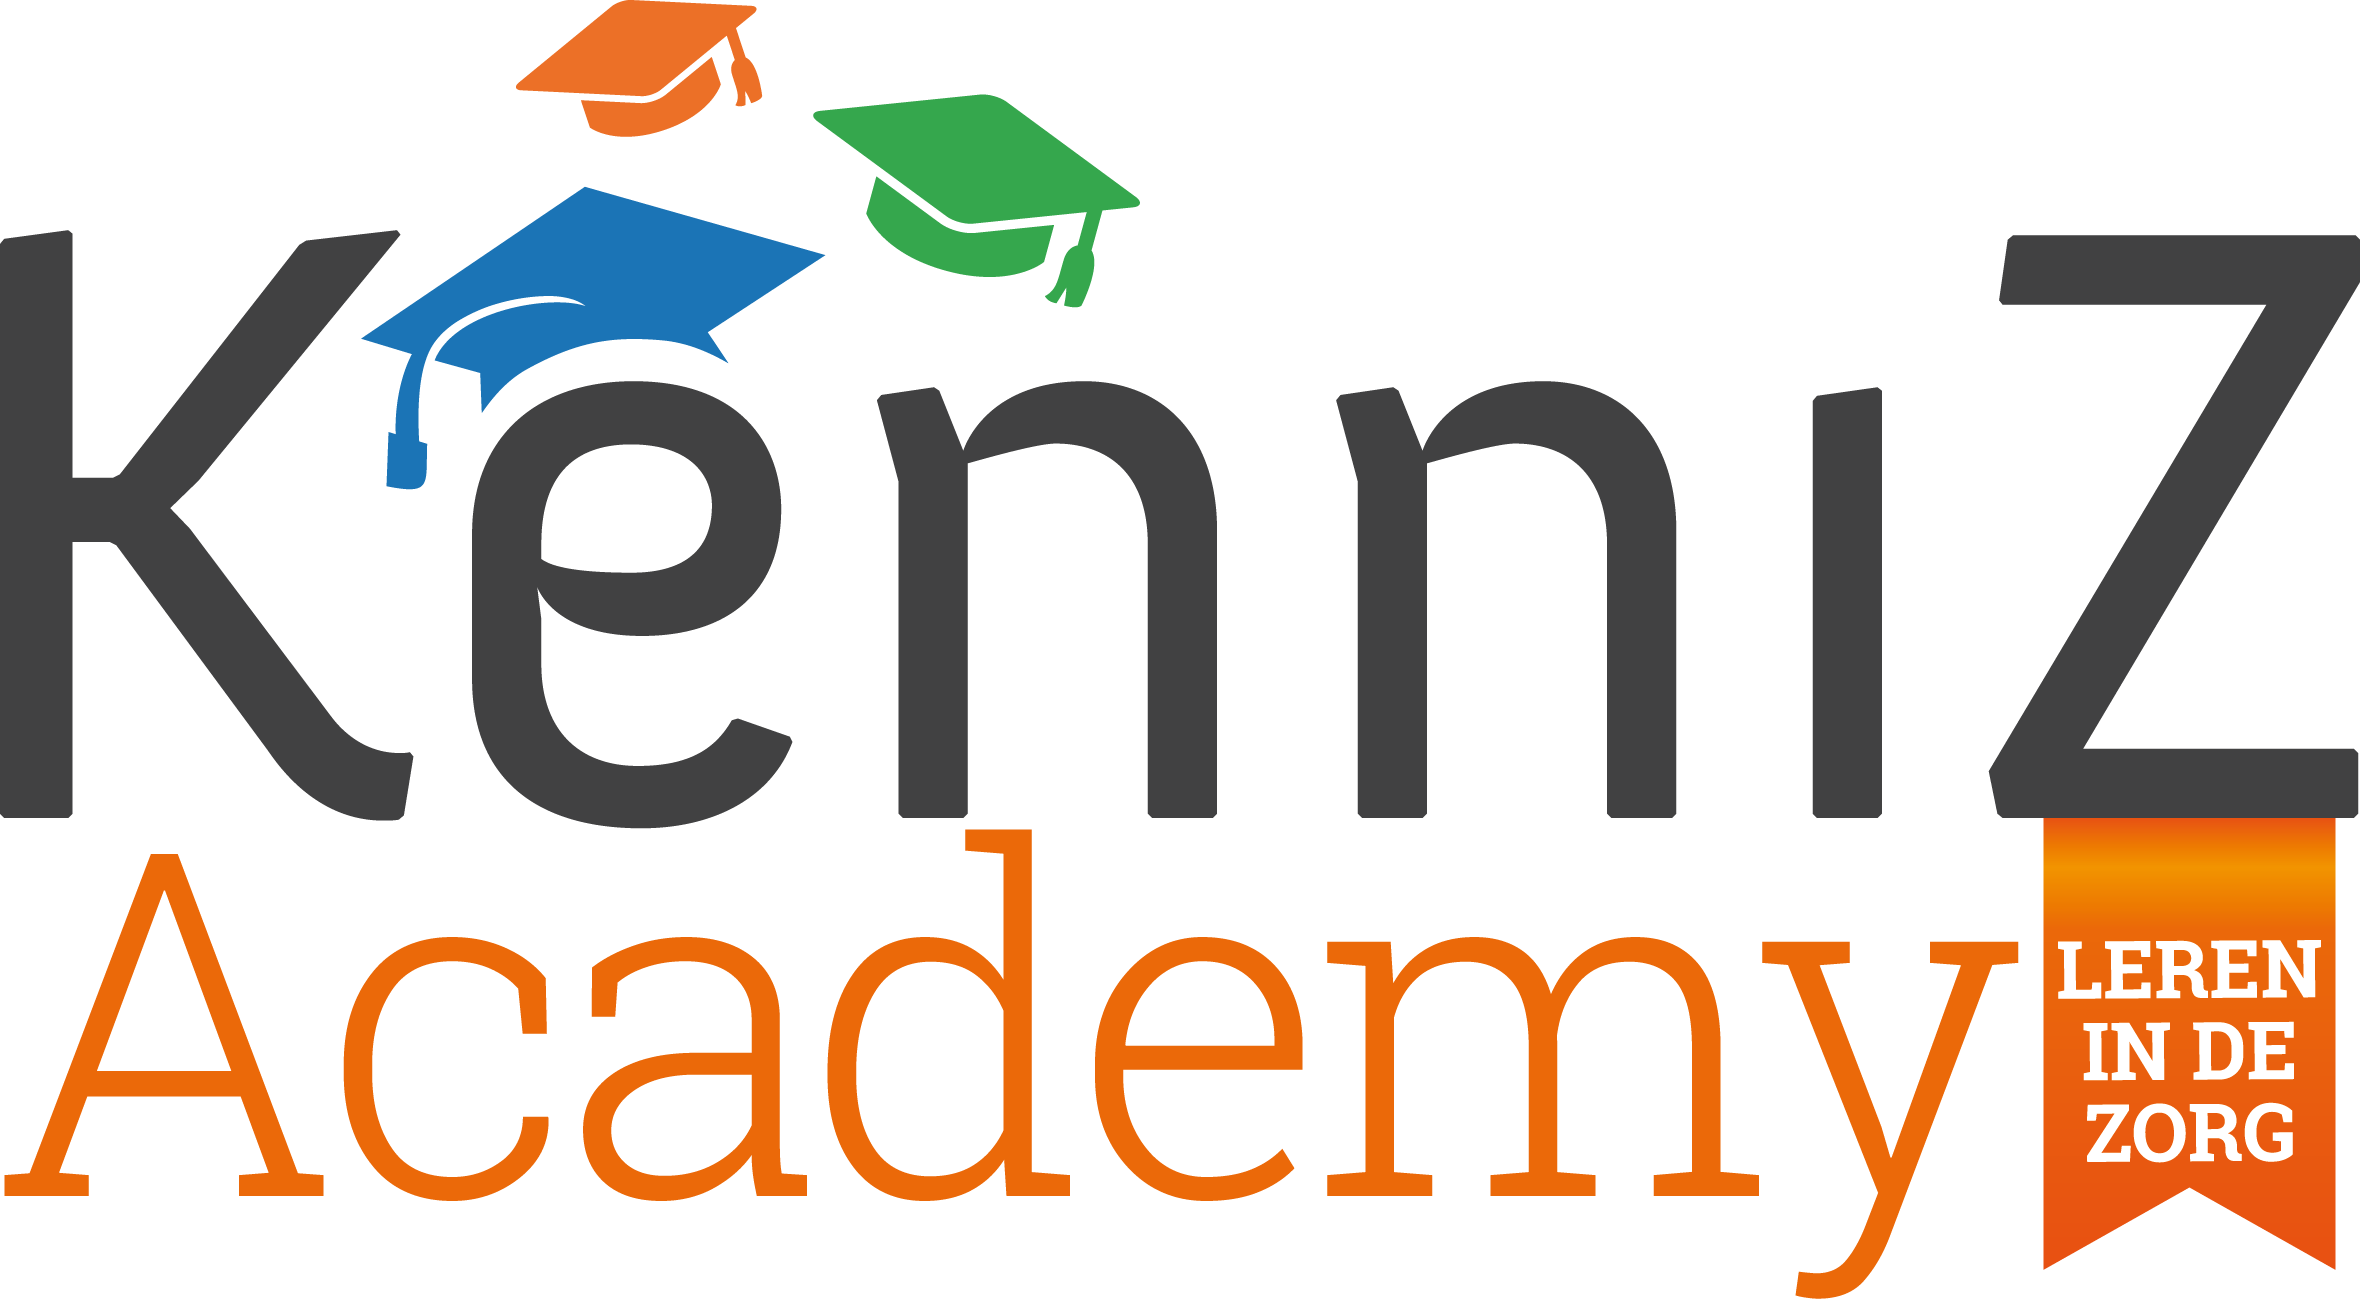 KenniZ Academy